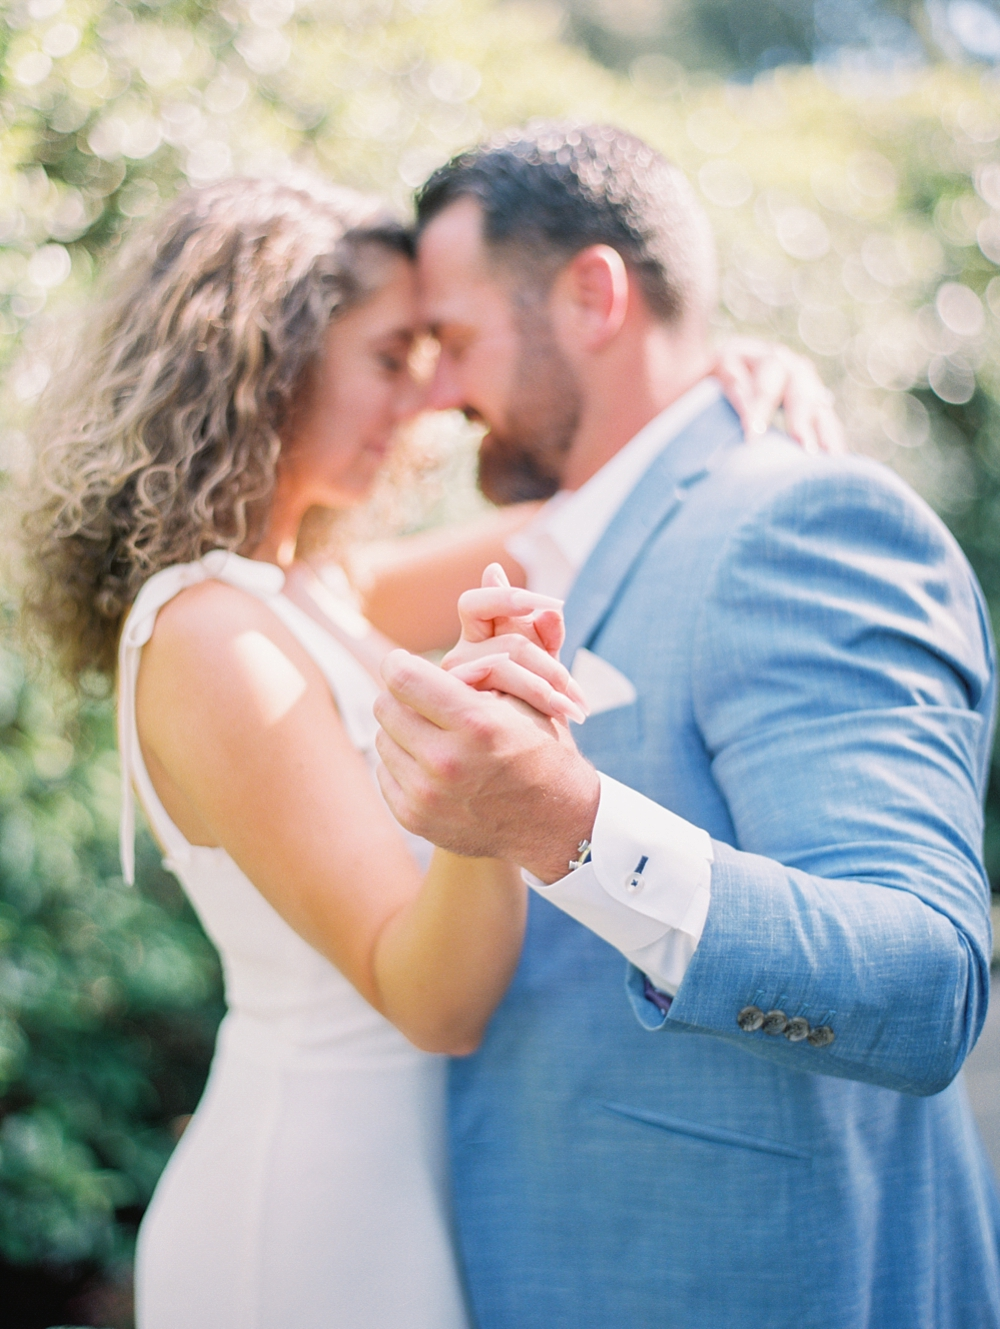 kristin-la-voie-photography-Dallas-Botanical-Garden-Arboretum-Engagement-fine-art-wedding-photographer-4